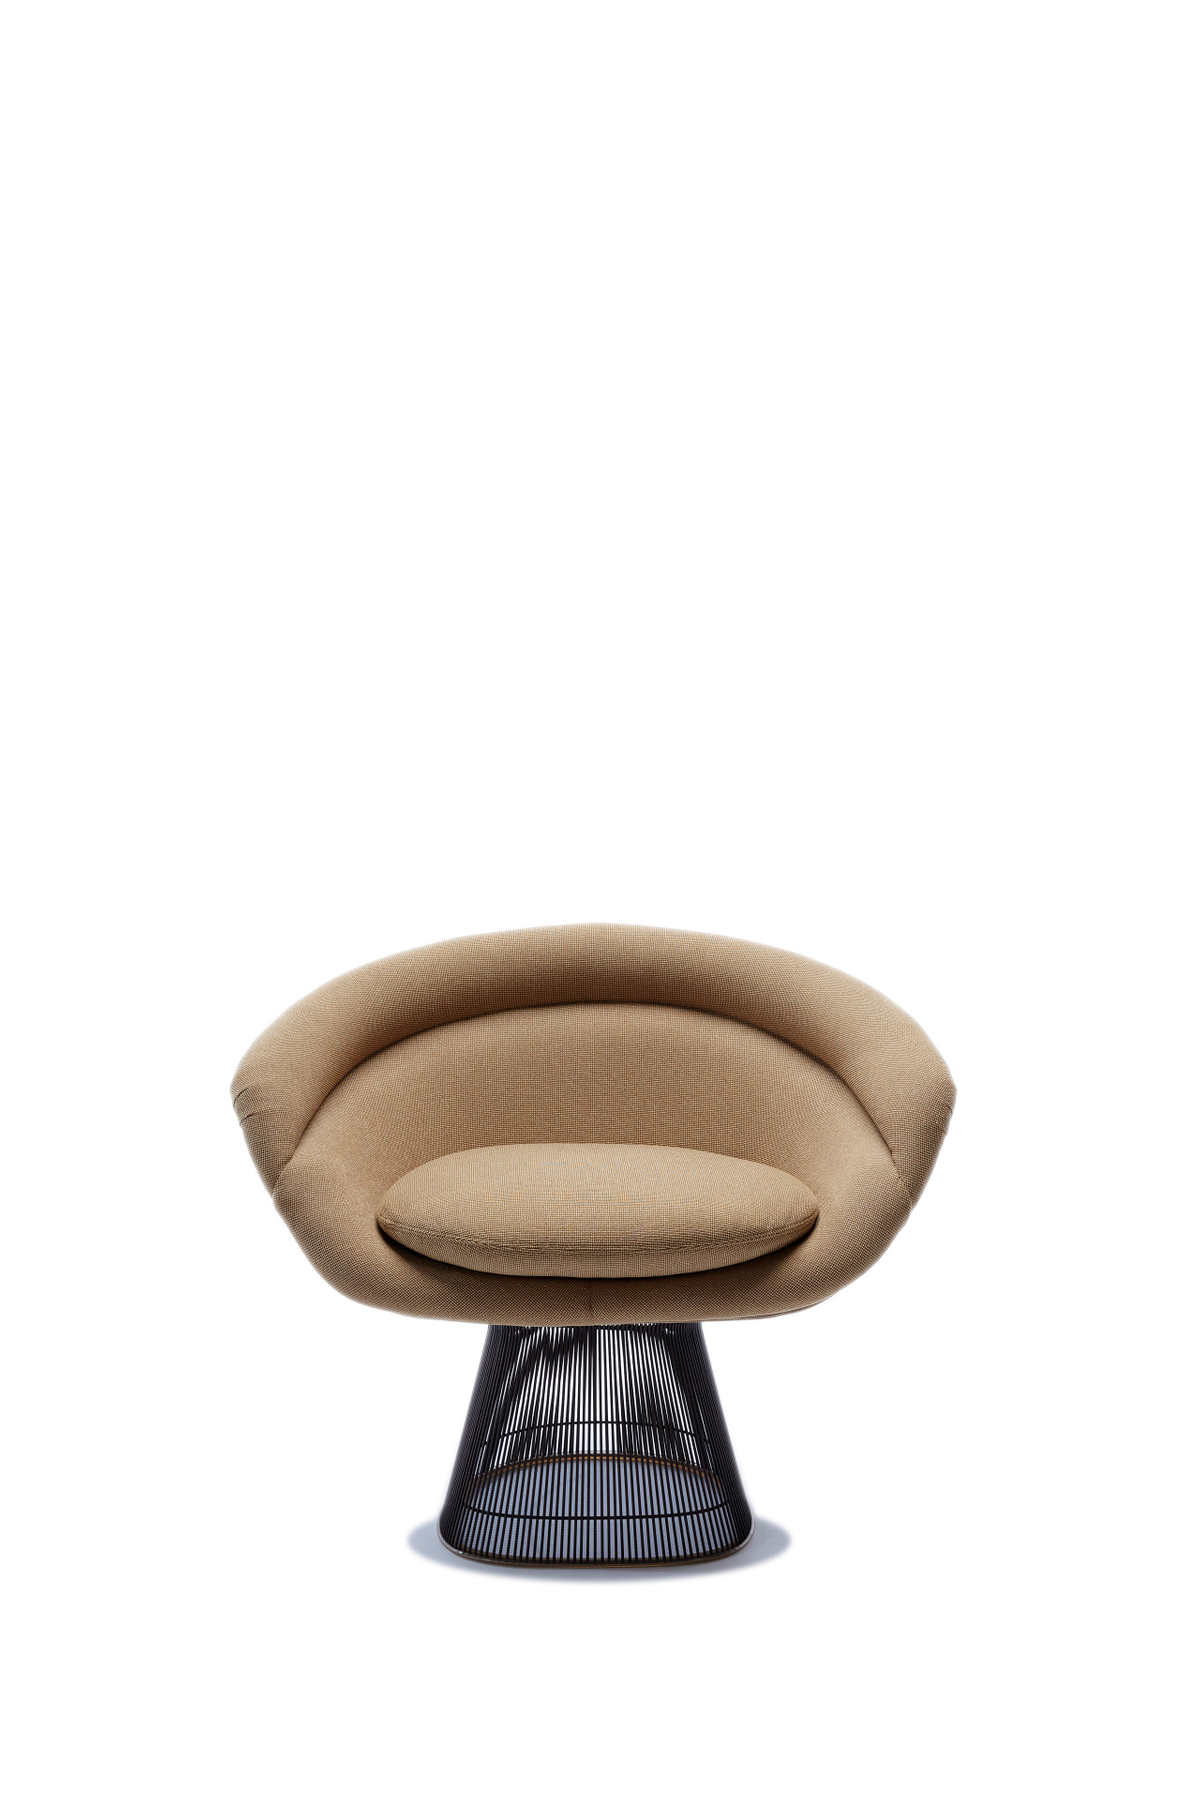 mid_century_chair.jpg